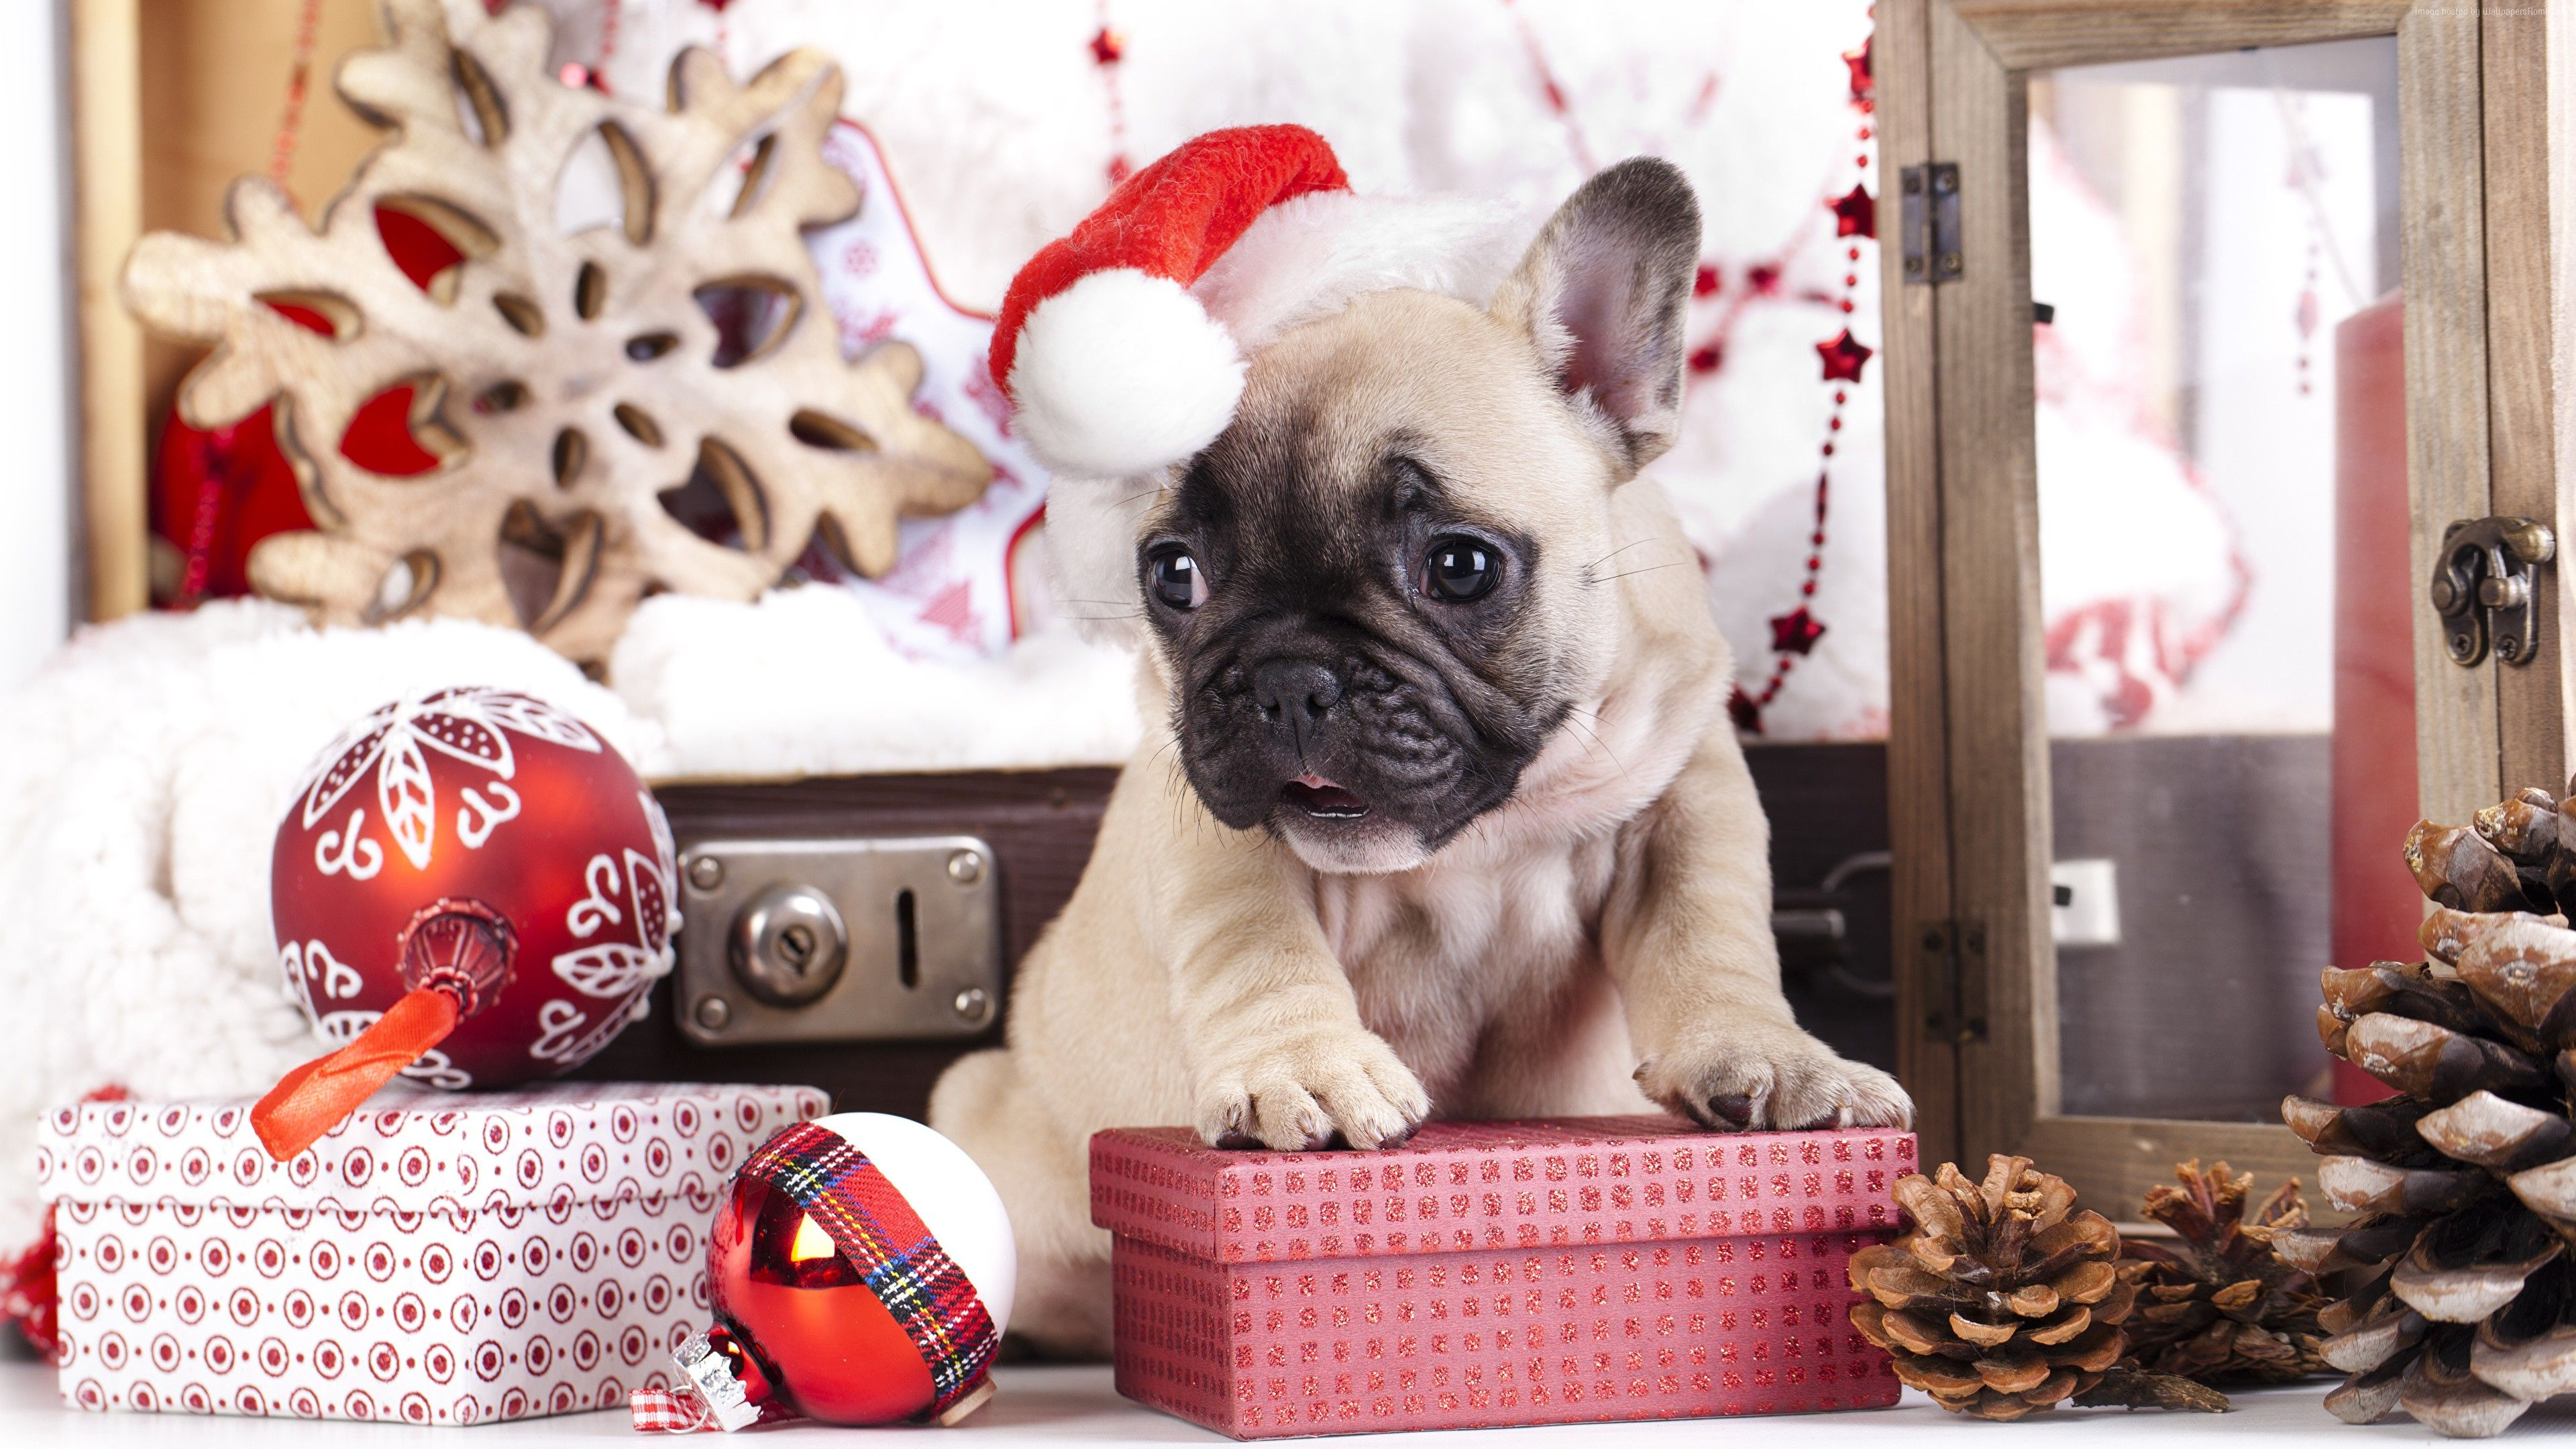 Wallpaper Puppy Cute Animals Christmas New Year 4k Holidays